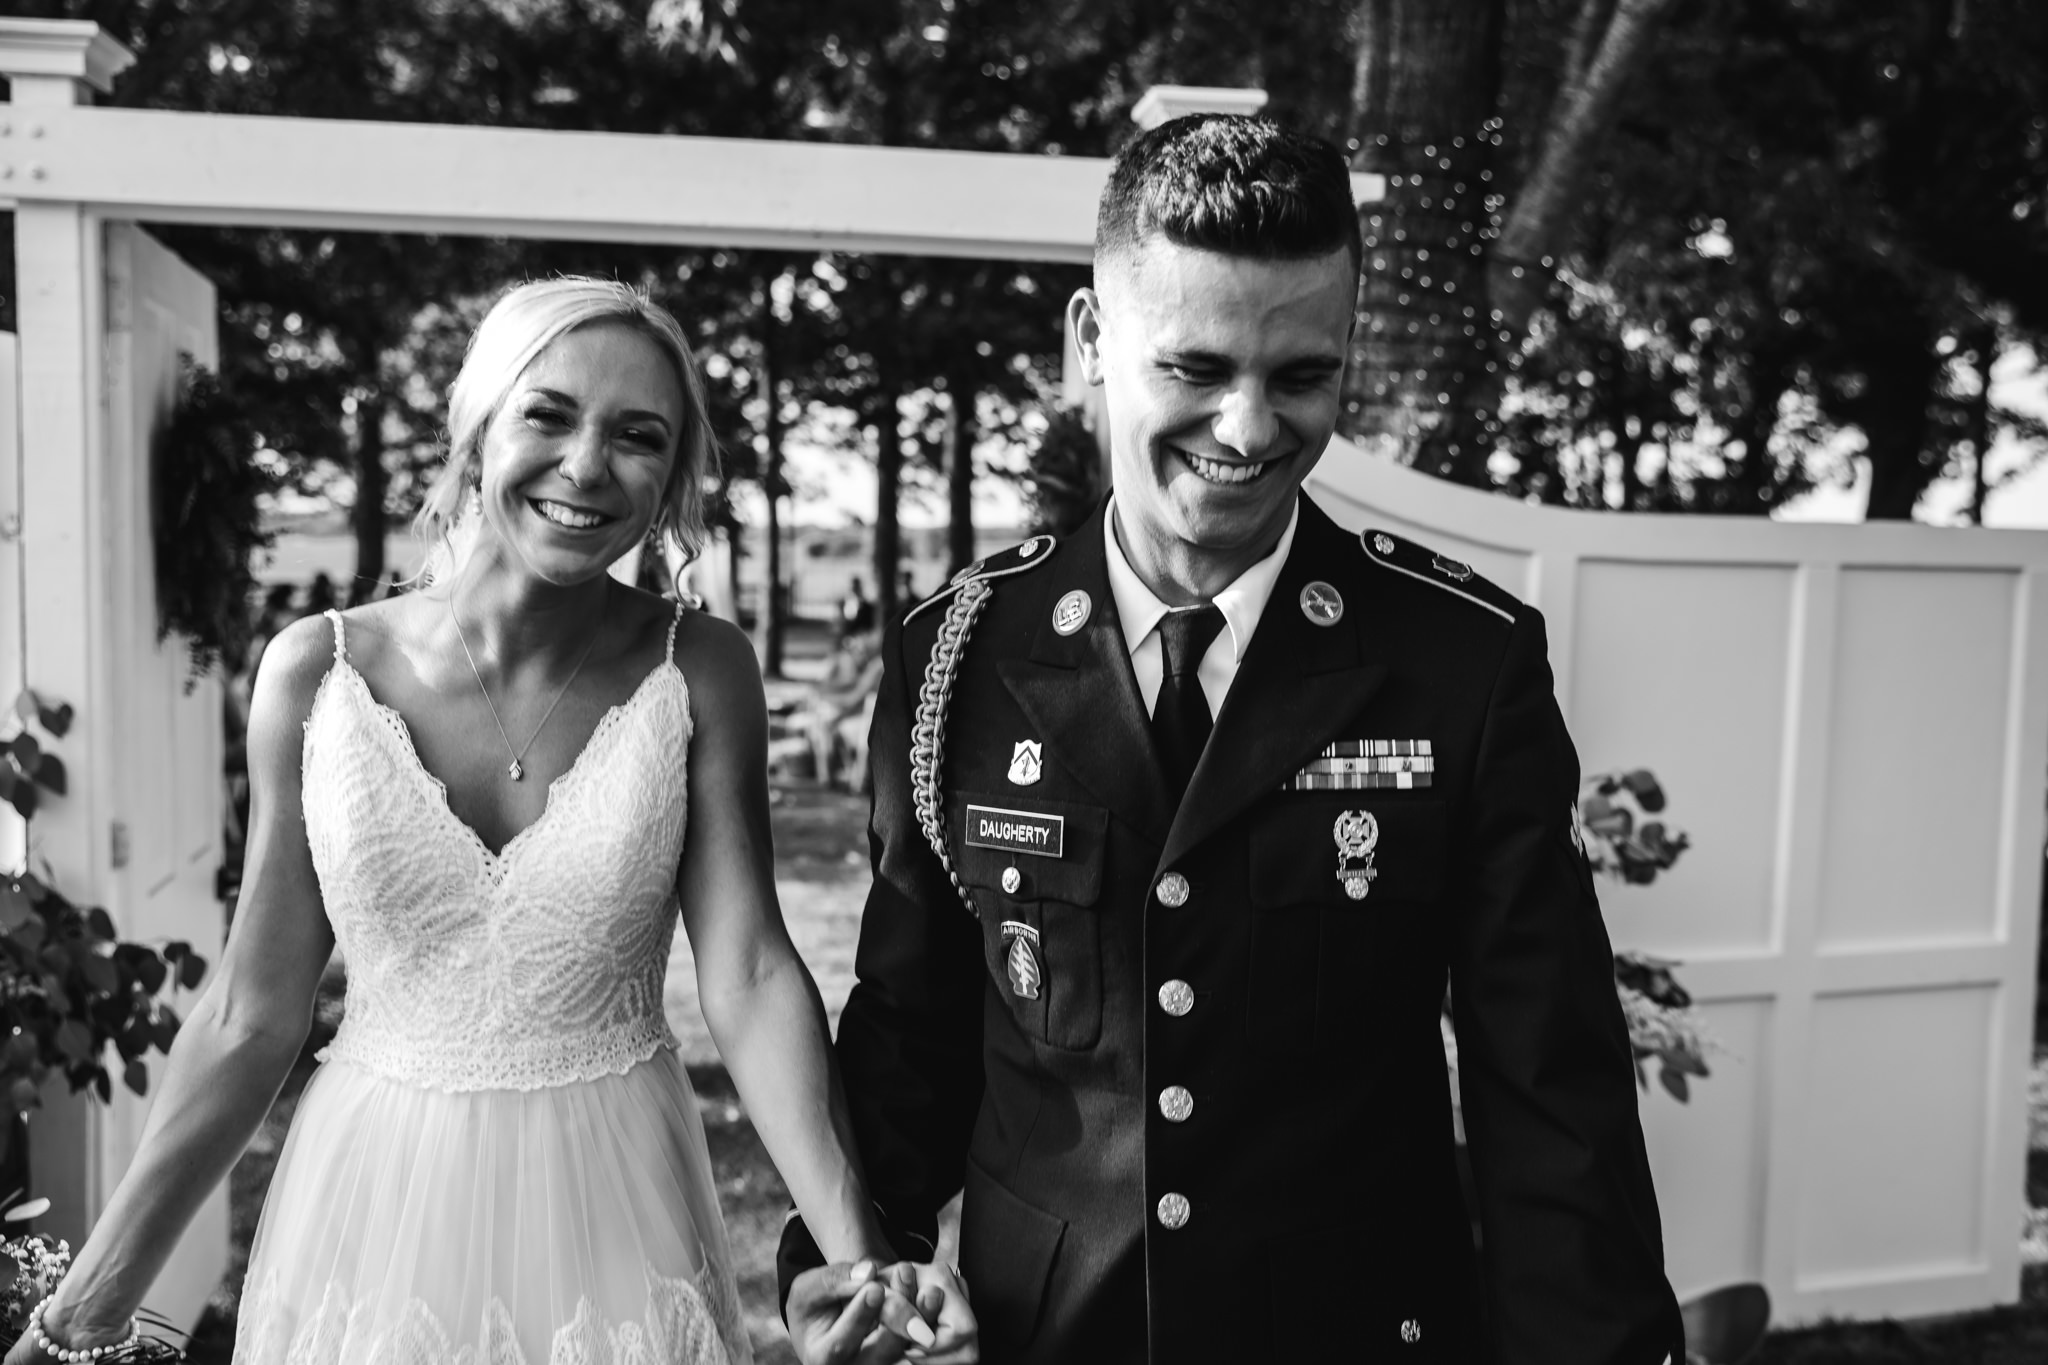 backyard-wedding-thewarmtharoundyou-lexy-branson-58.jpg